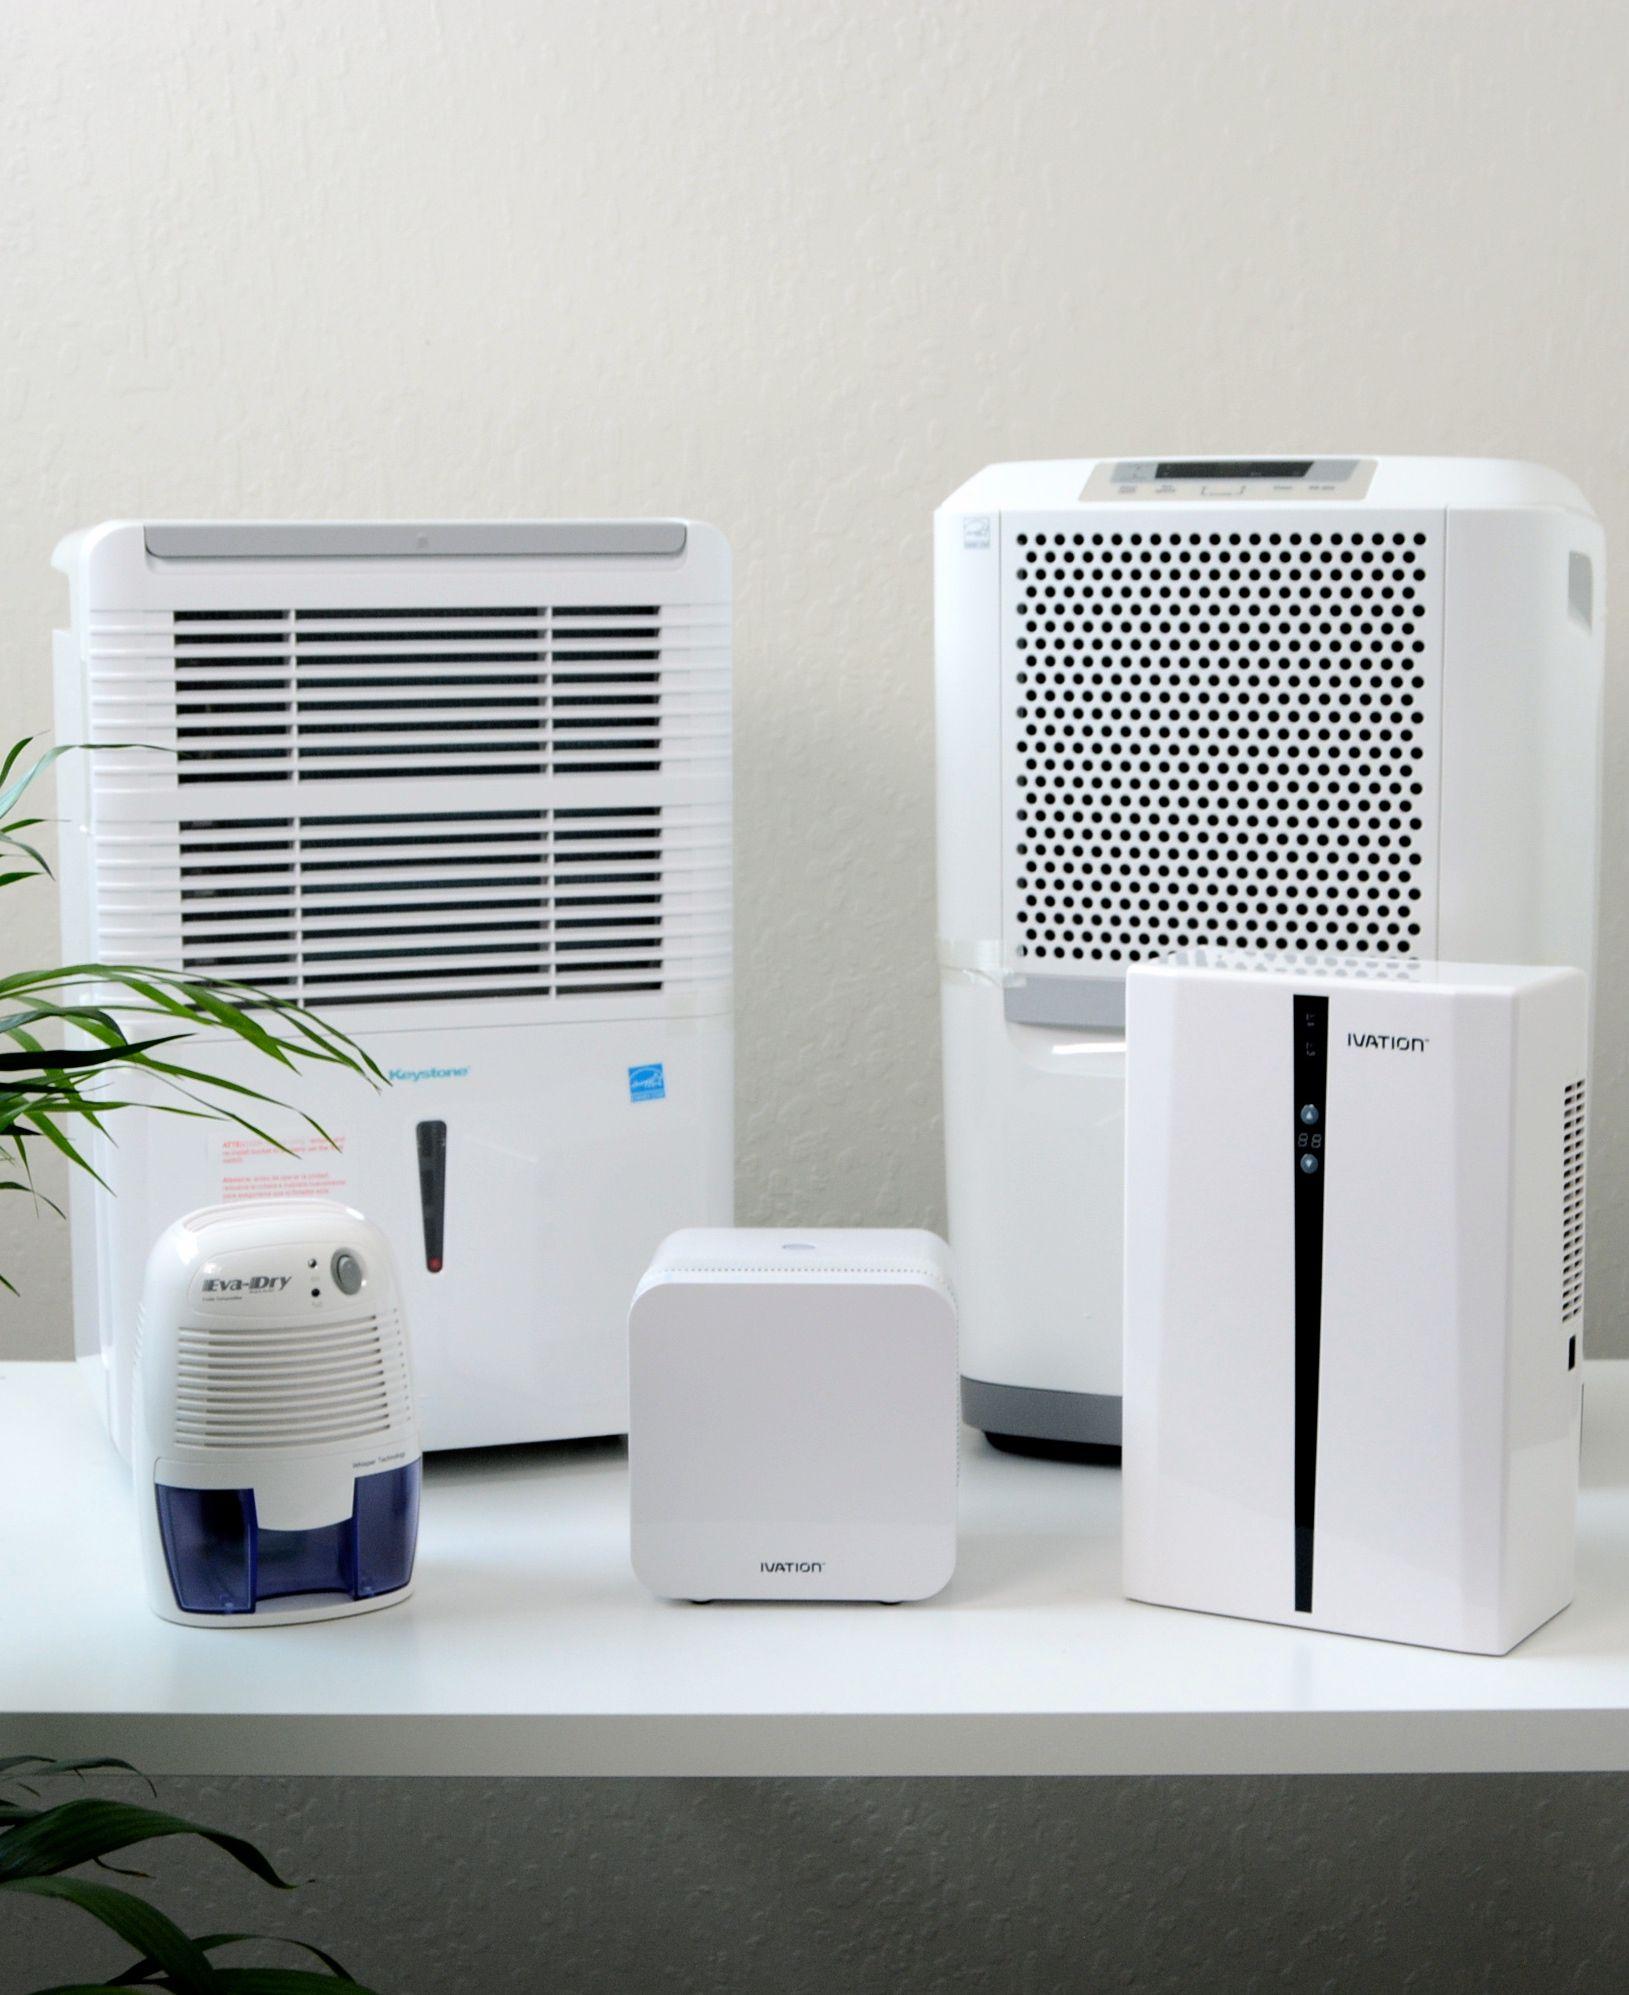 Best Dehumidifiers Dehumidifiers, Home appliances, Cool